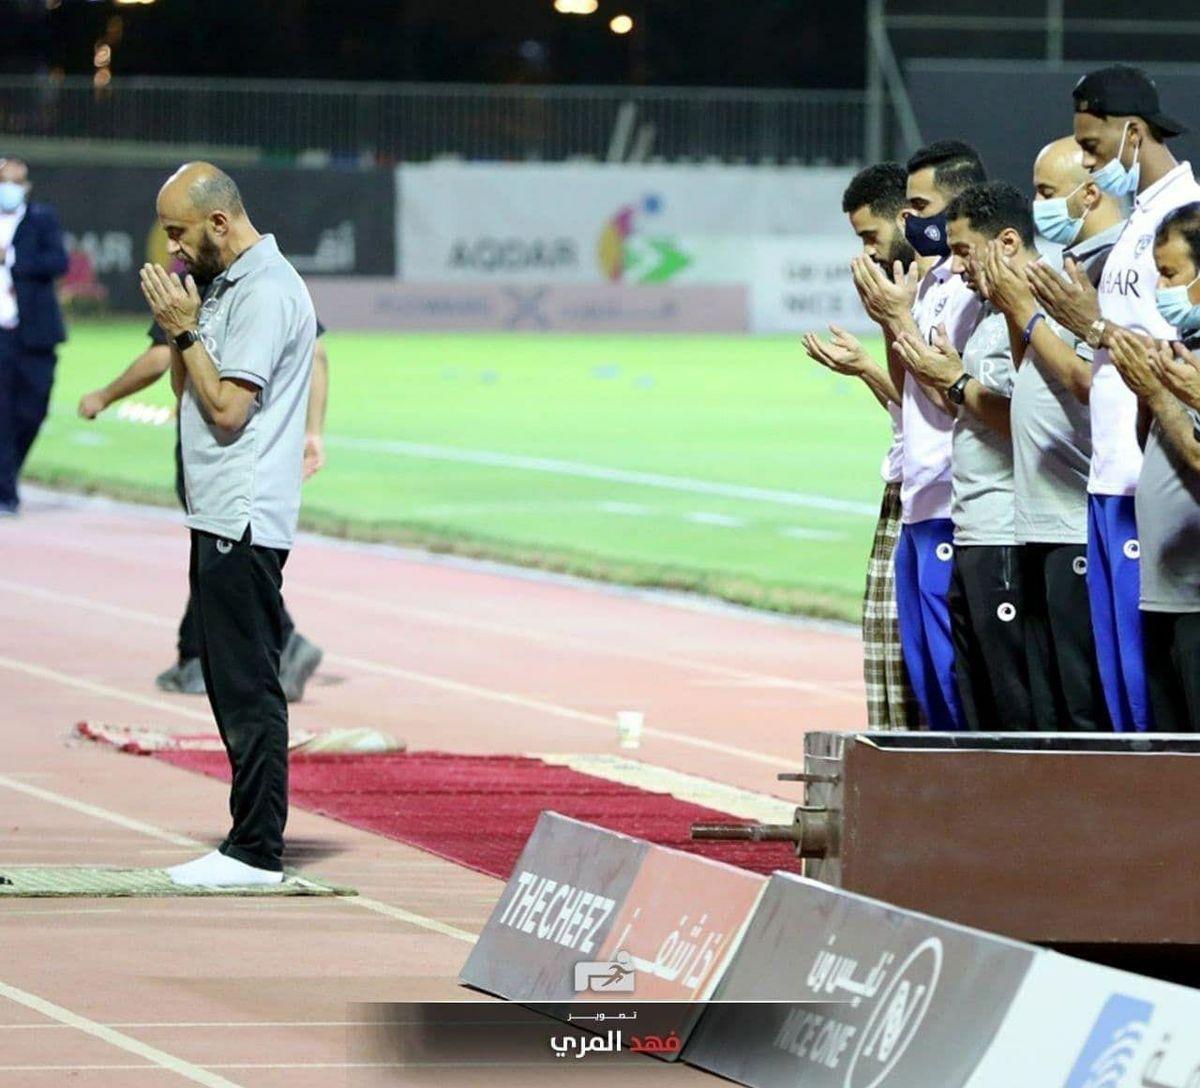 عکس نماز جماعت رقیب استقلال در استادیوم فوتبال